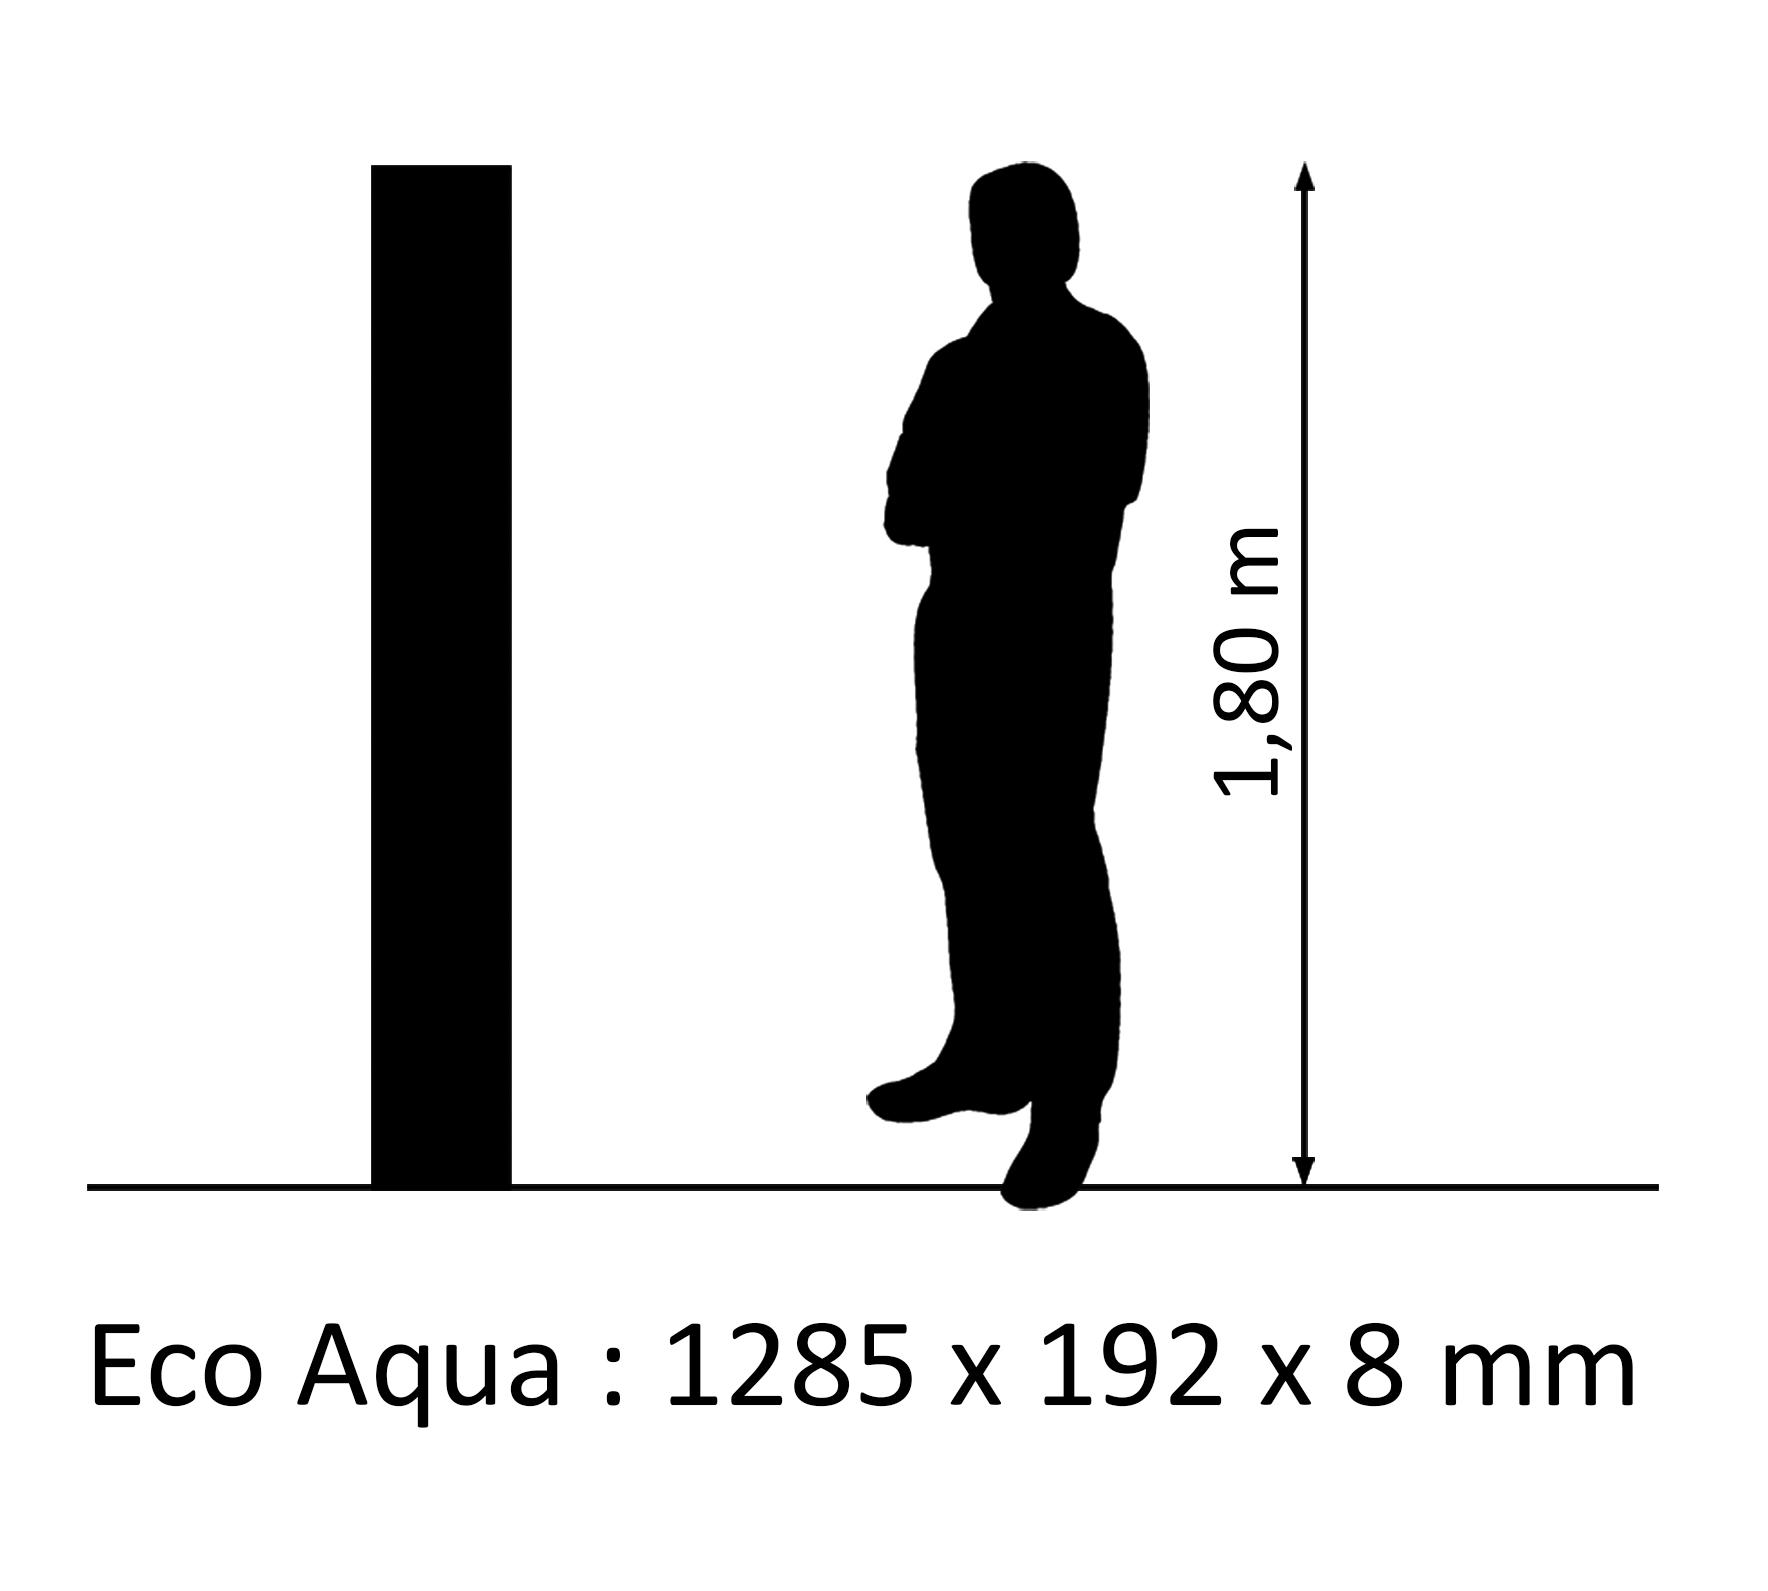 Wiparquet Eco Aqua Lorenzo